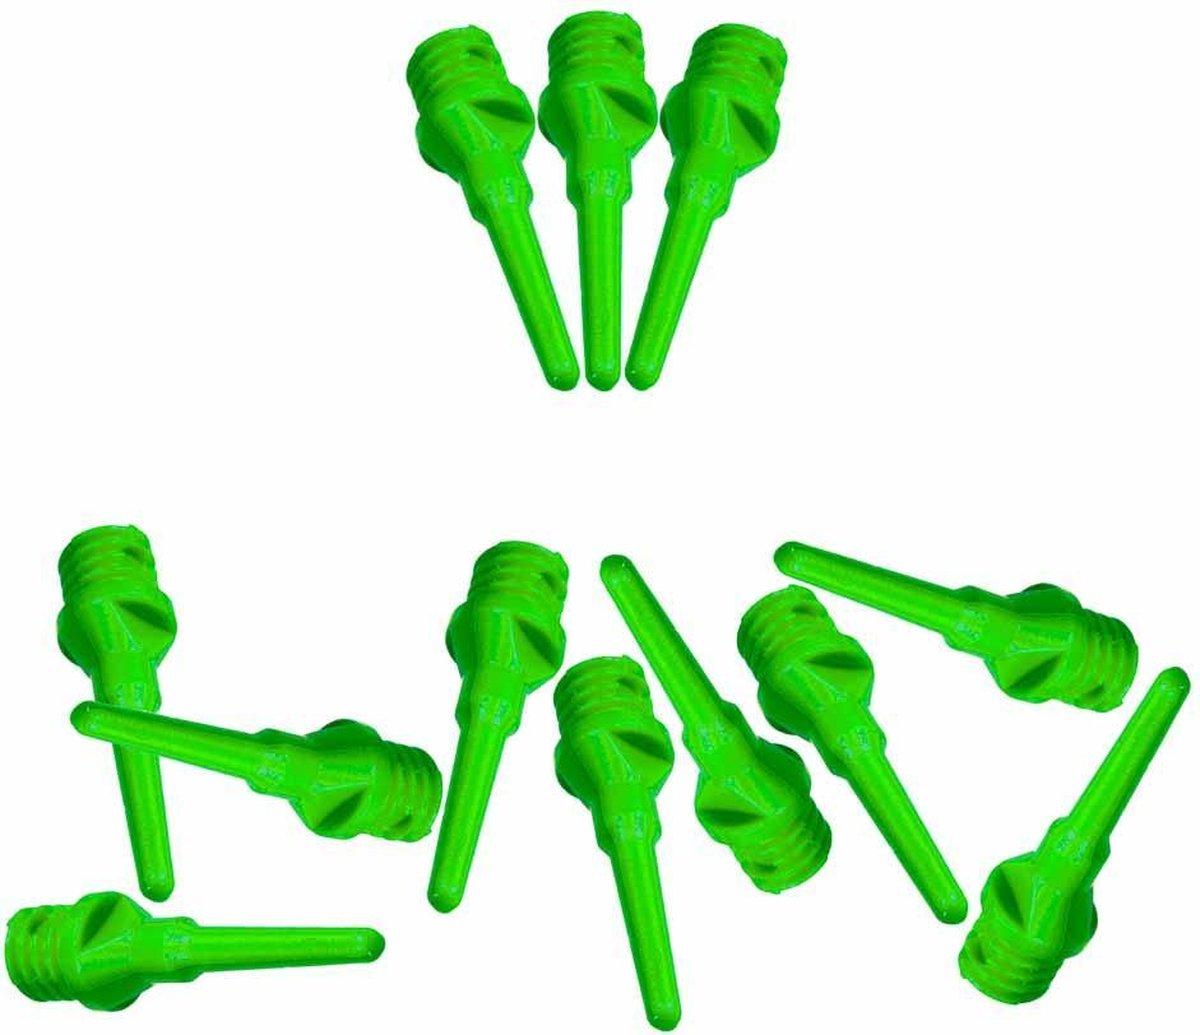 ABC Darts - Softtip Dartpunten 21 mm - Neon Groen - ca 1000 stuks